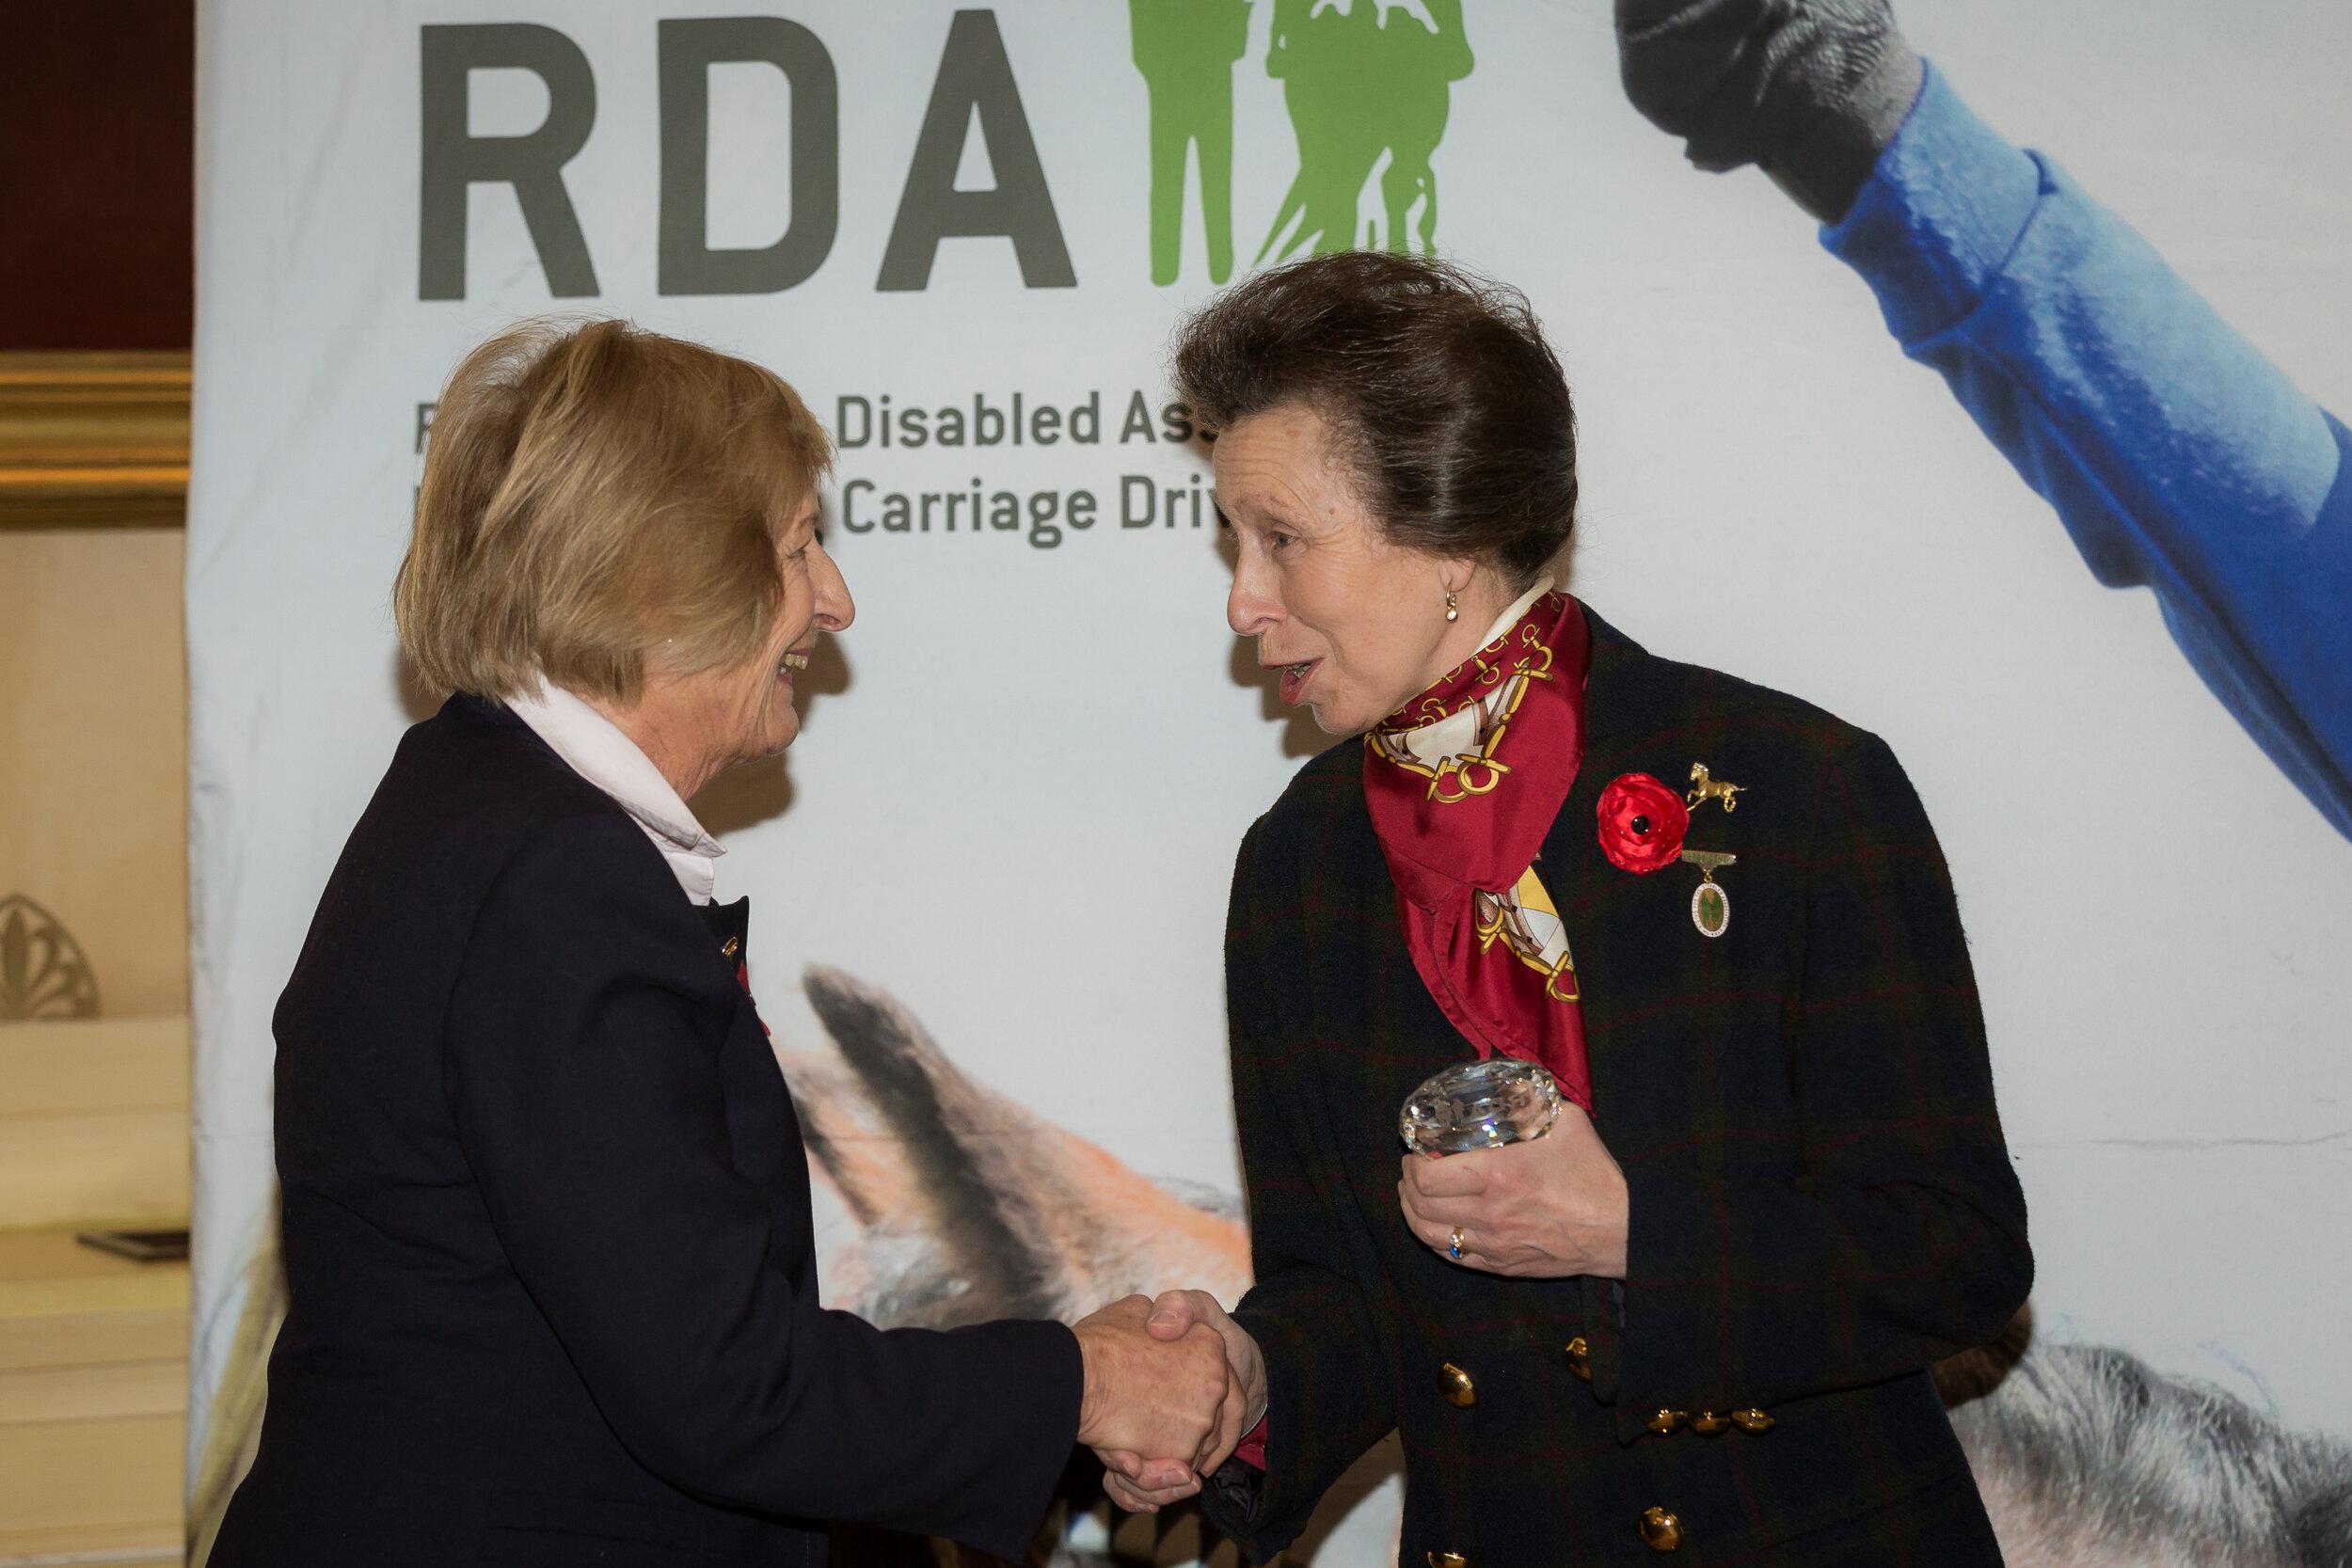 Gay Redman receiving an award for volunteering from HRH The Princess Royal